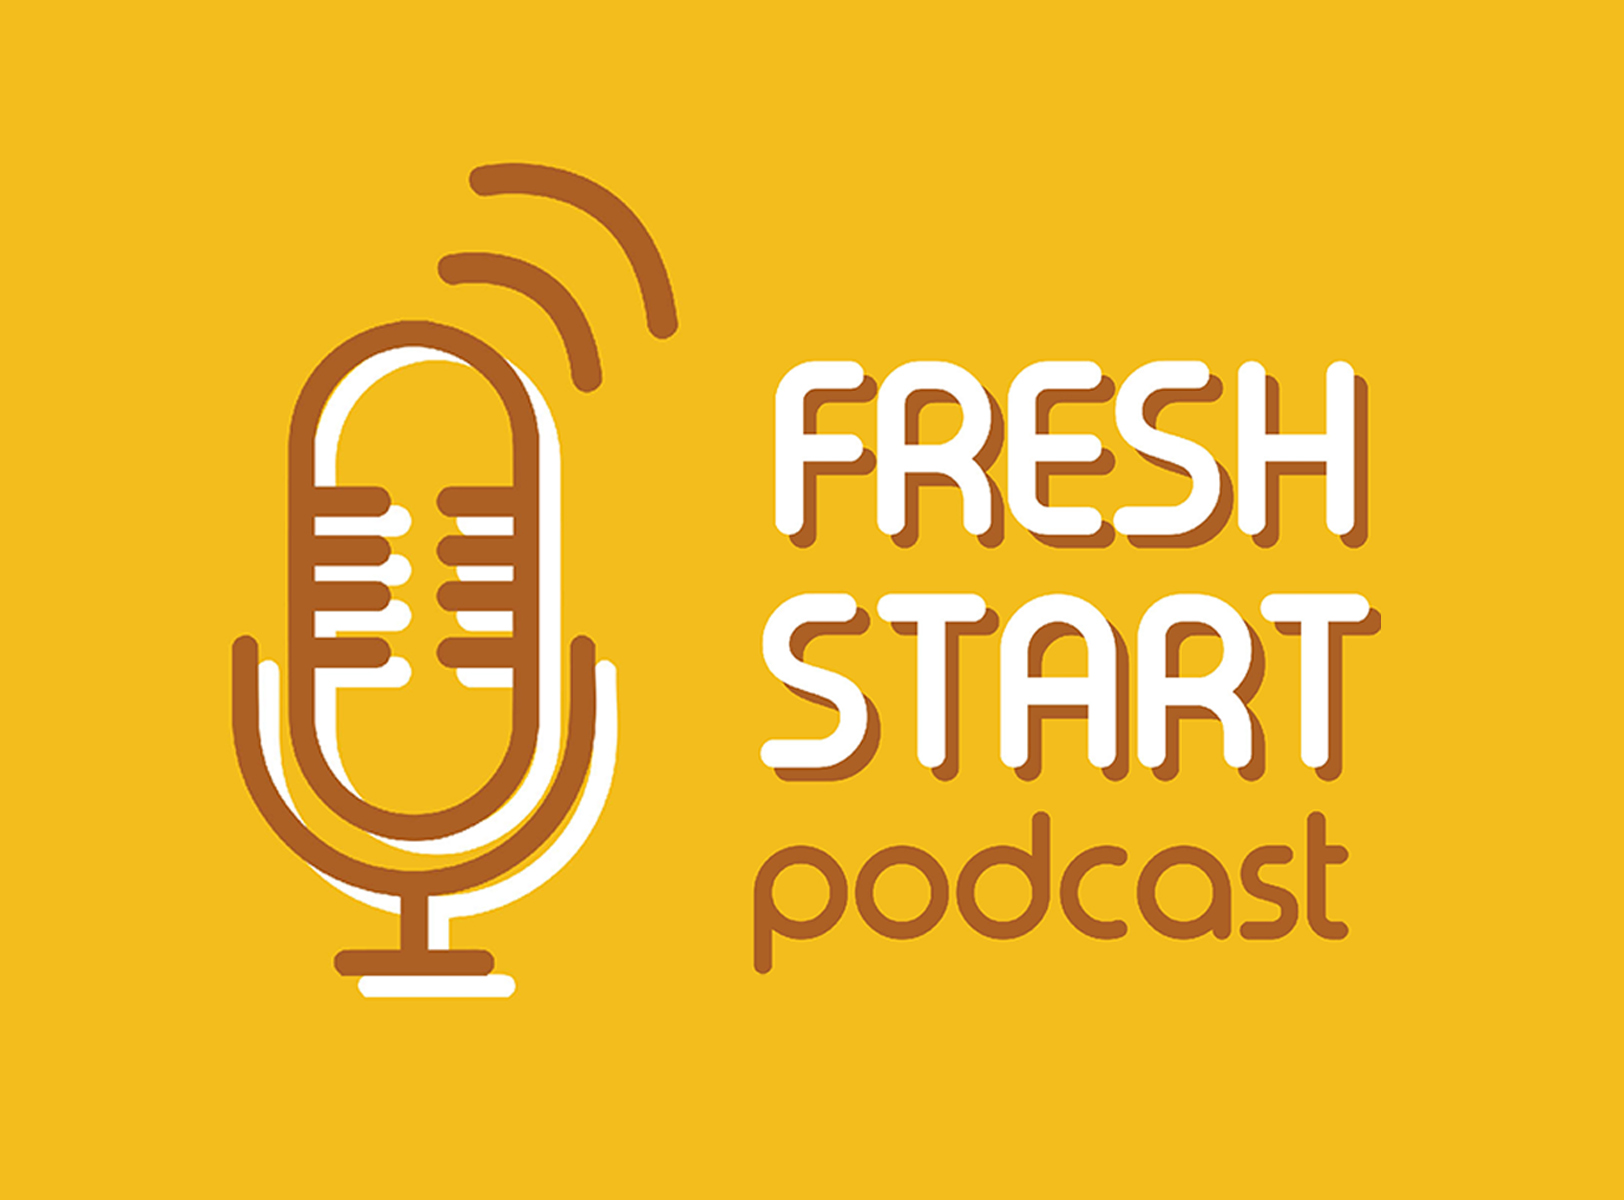 Fresh Start: Podcast News (8/20/2019 Tue.)